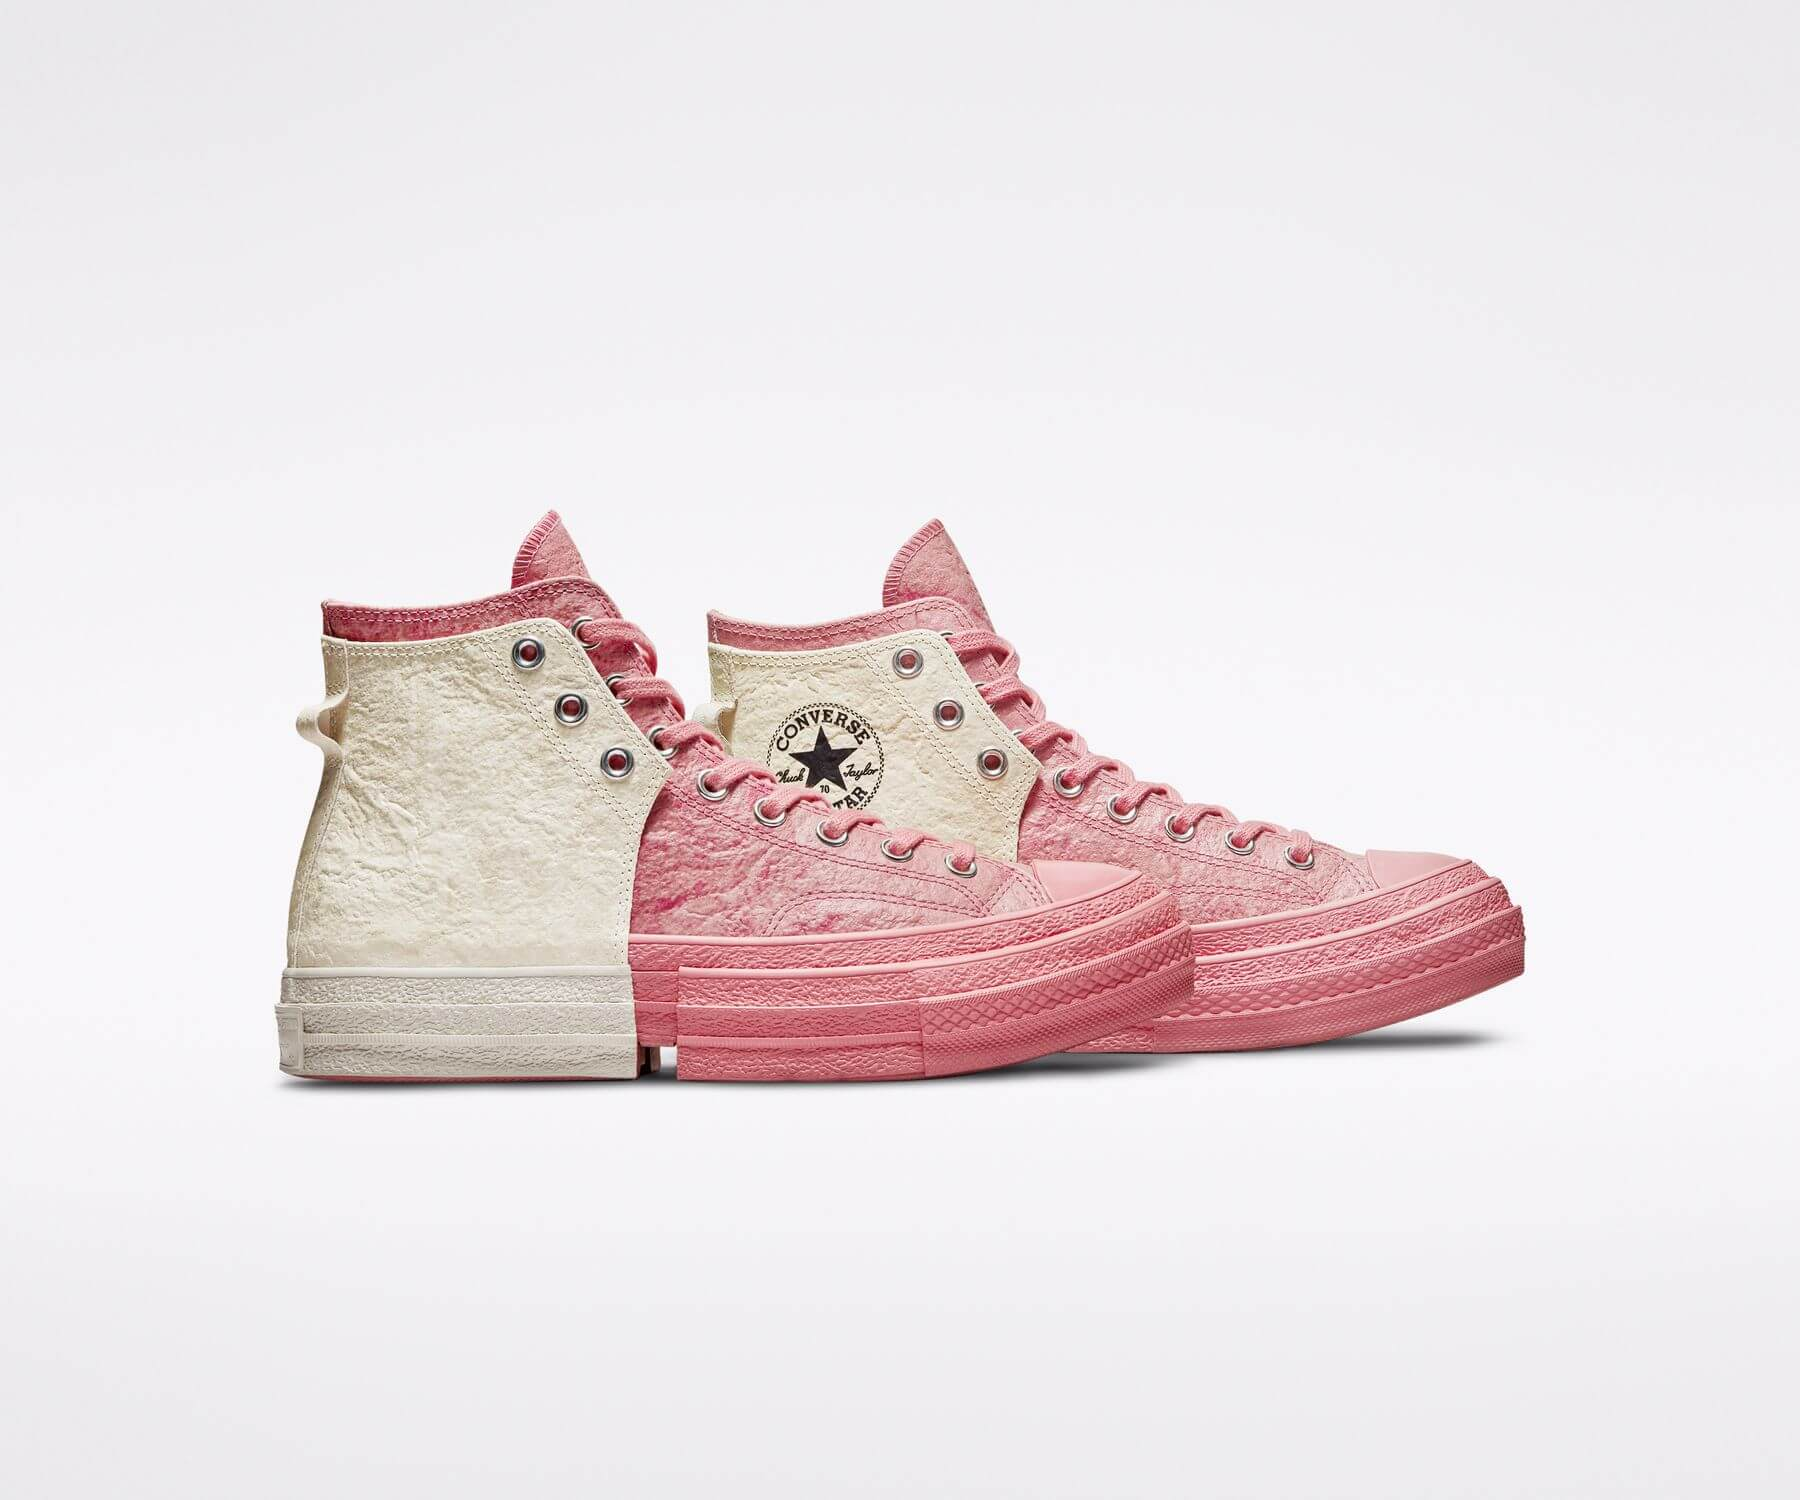 Converse x Feng Chen Wang - 2-in-1 Chuck 70 - pink/white - 171837C